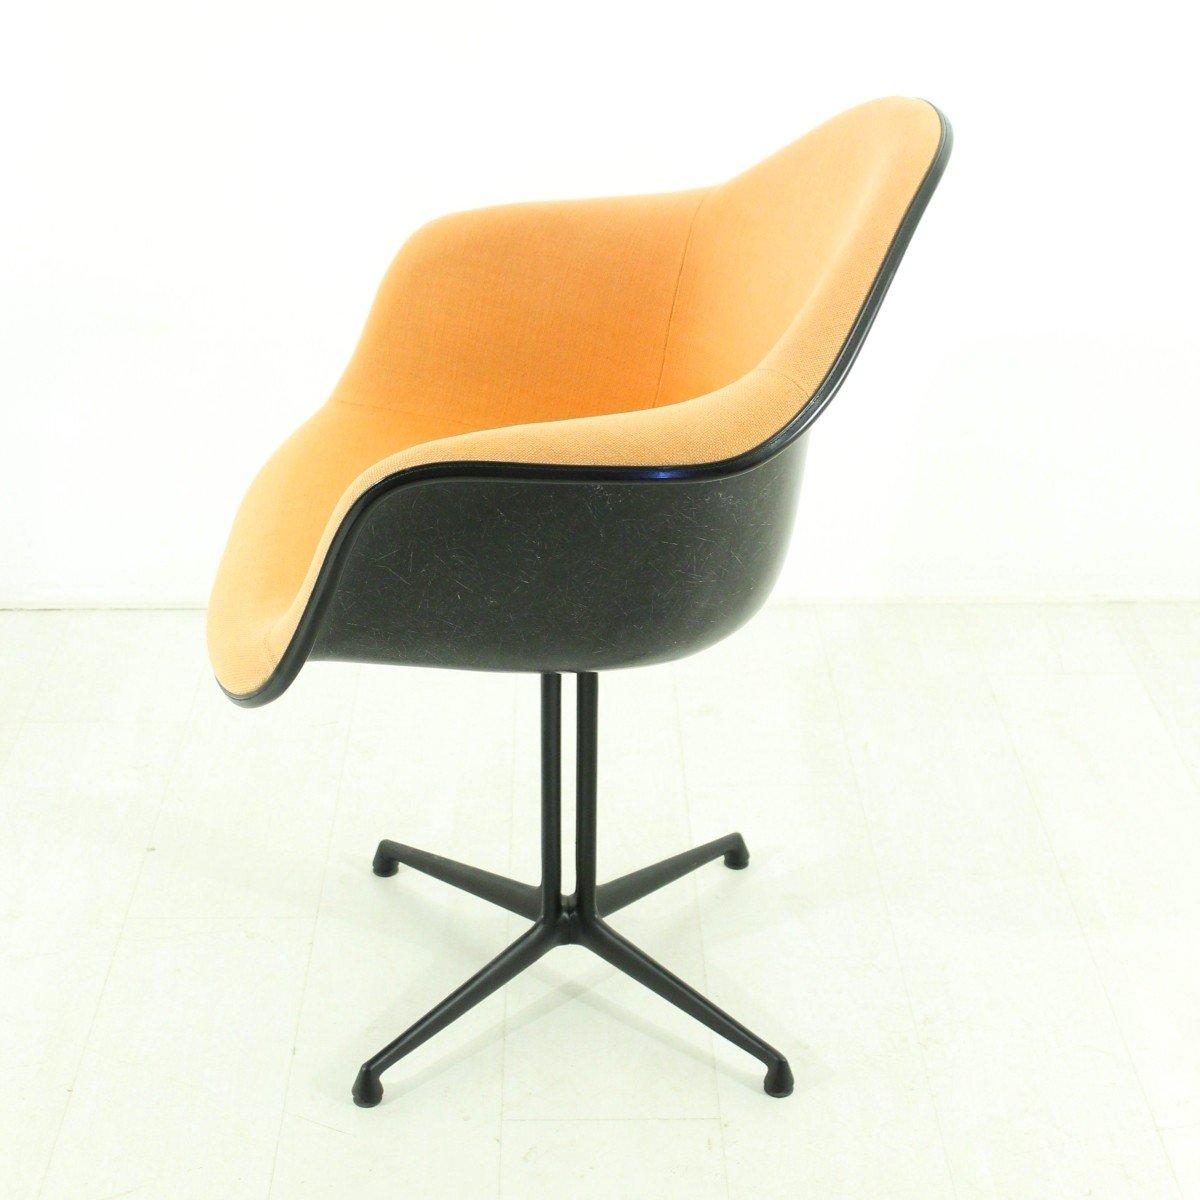 vintage terrakotta la fonda sessel von charles ray eames. Black Bedroom Furniture Sets. Home Design Ideas